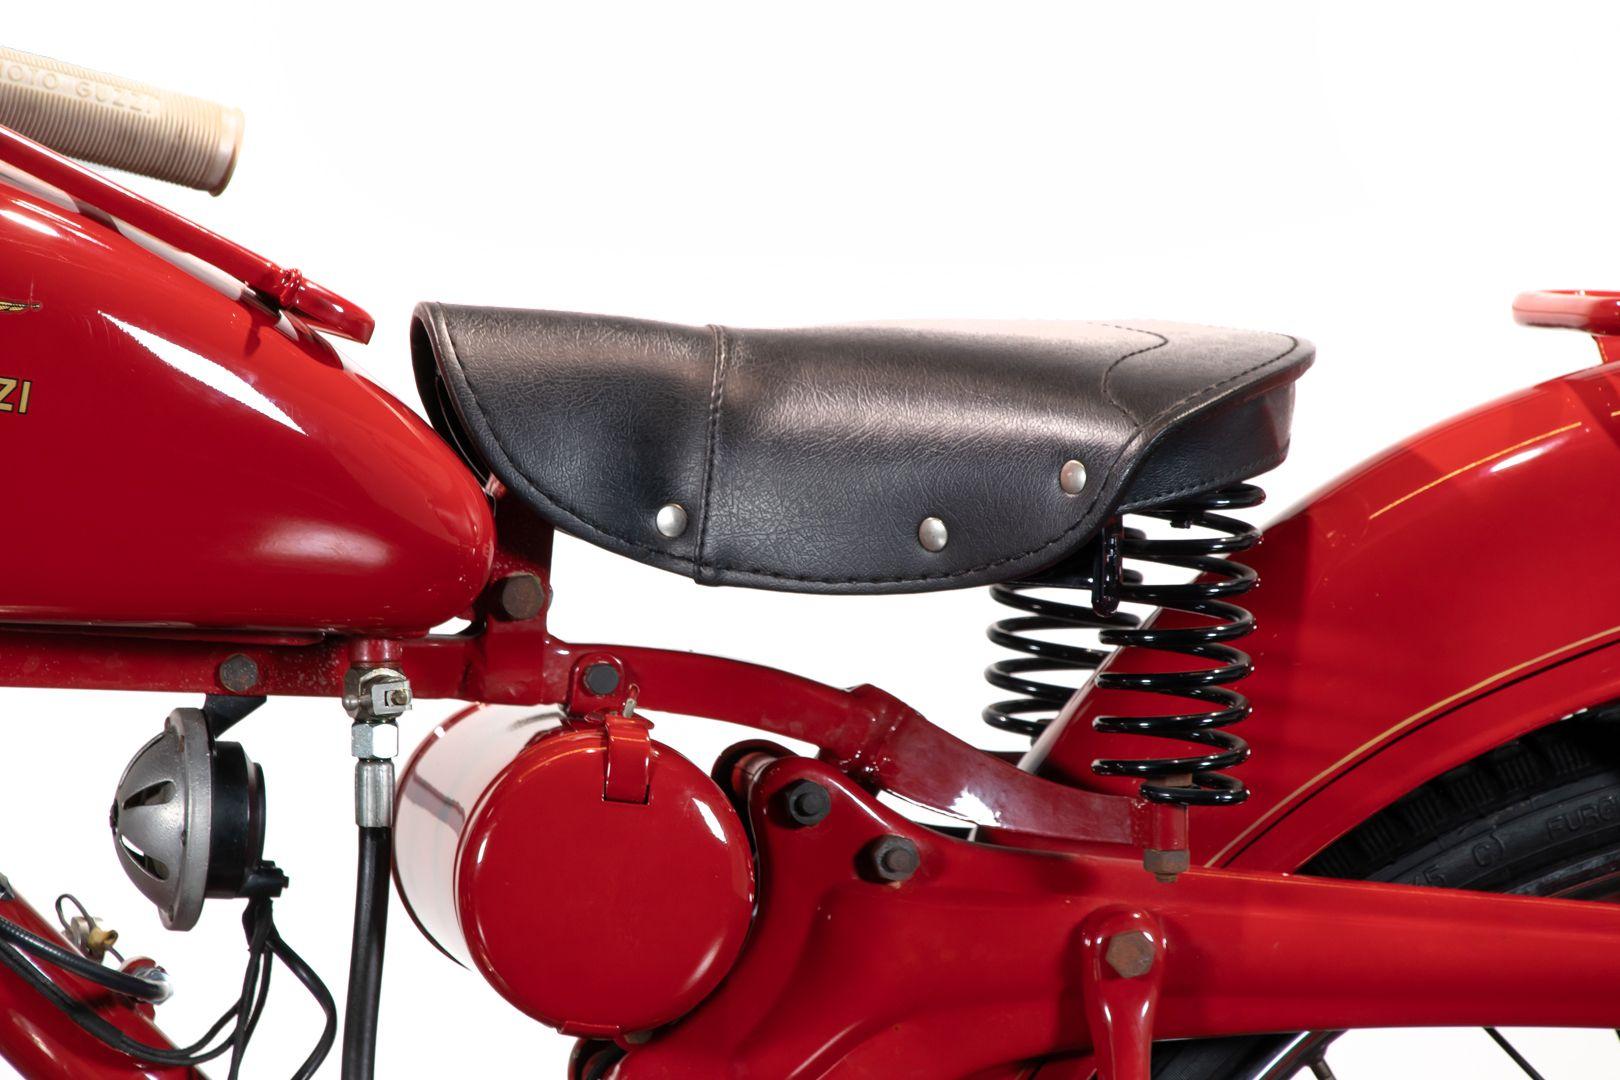 1952 Moto Guzzi 65 59390